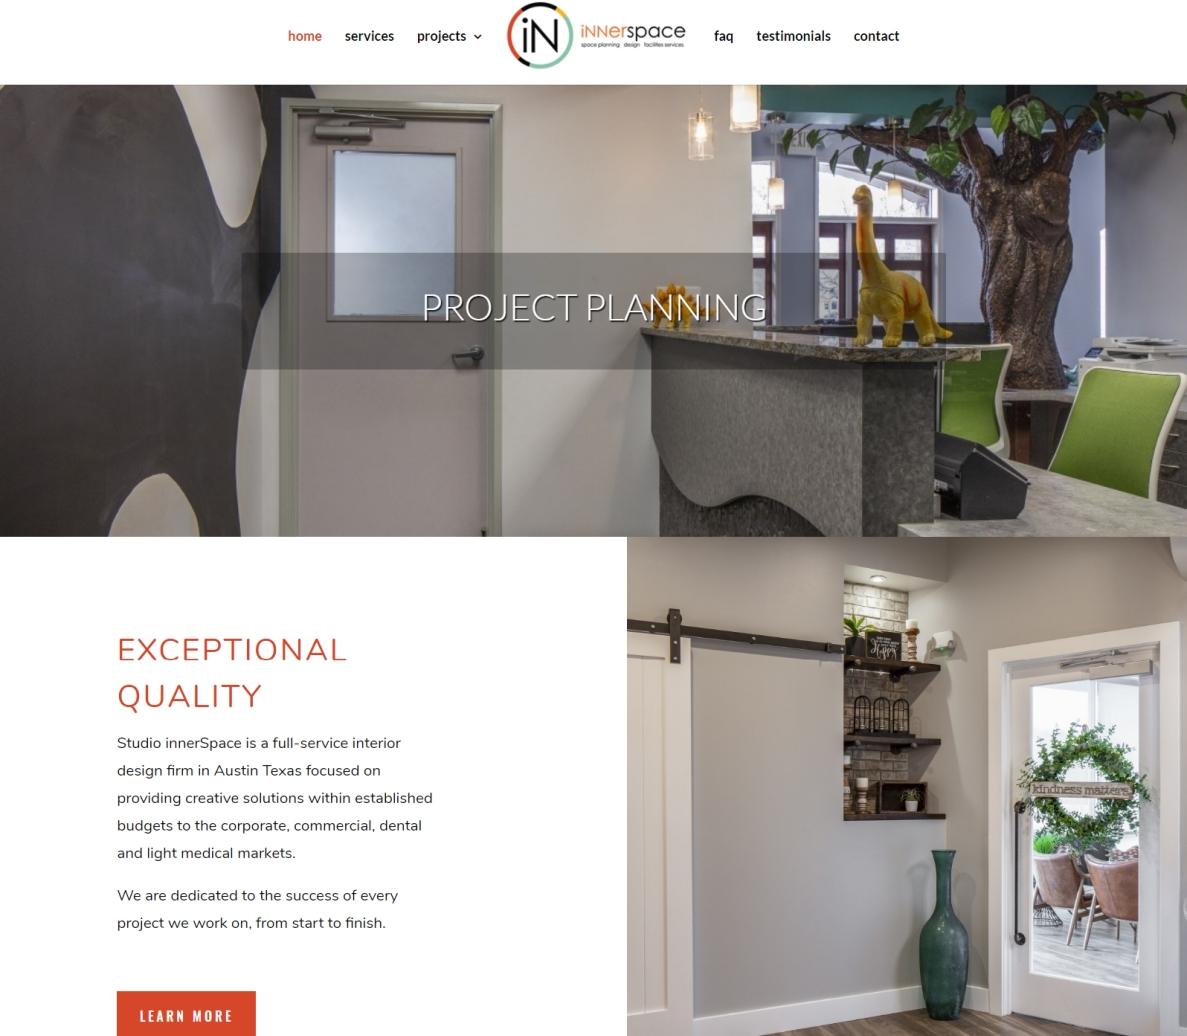 Website Designed for Studio Innerspace